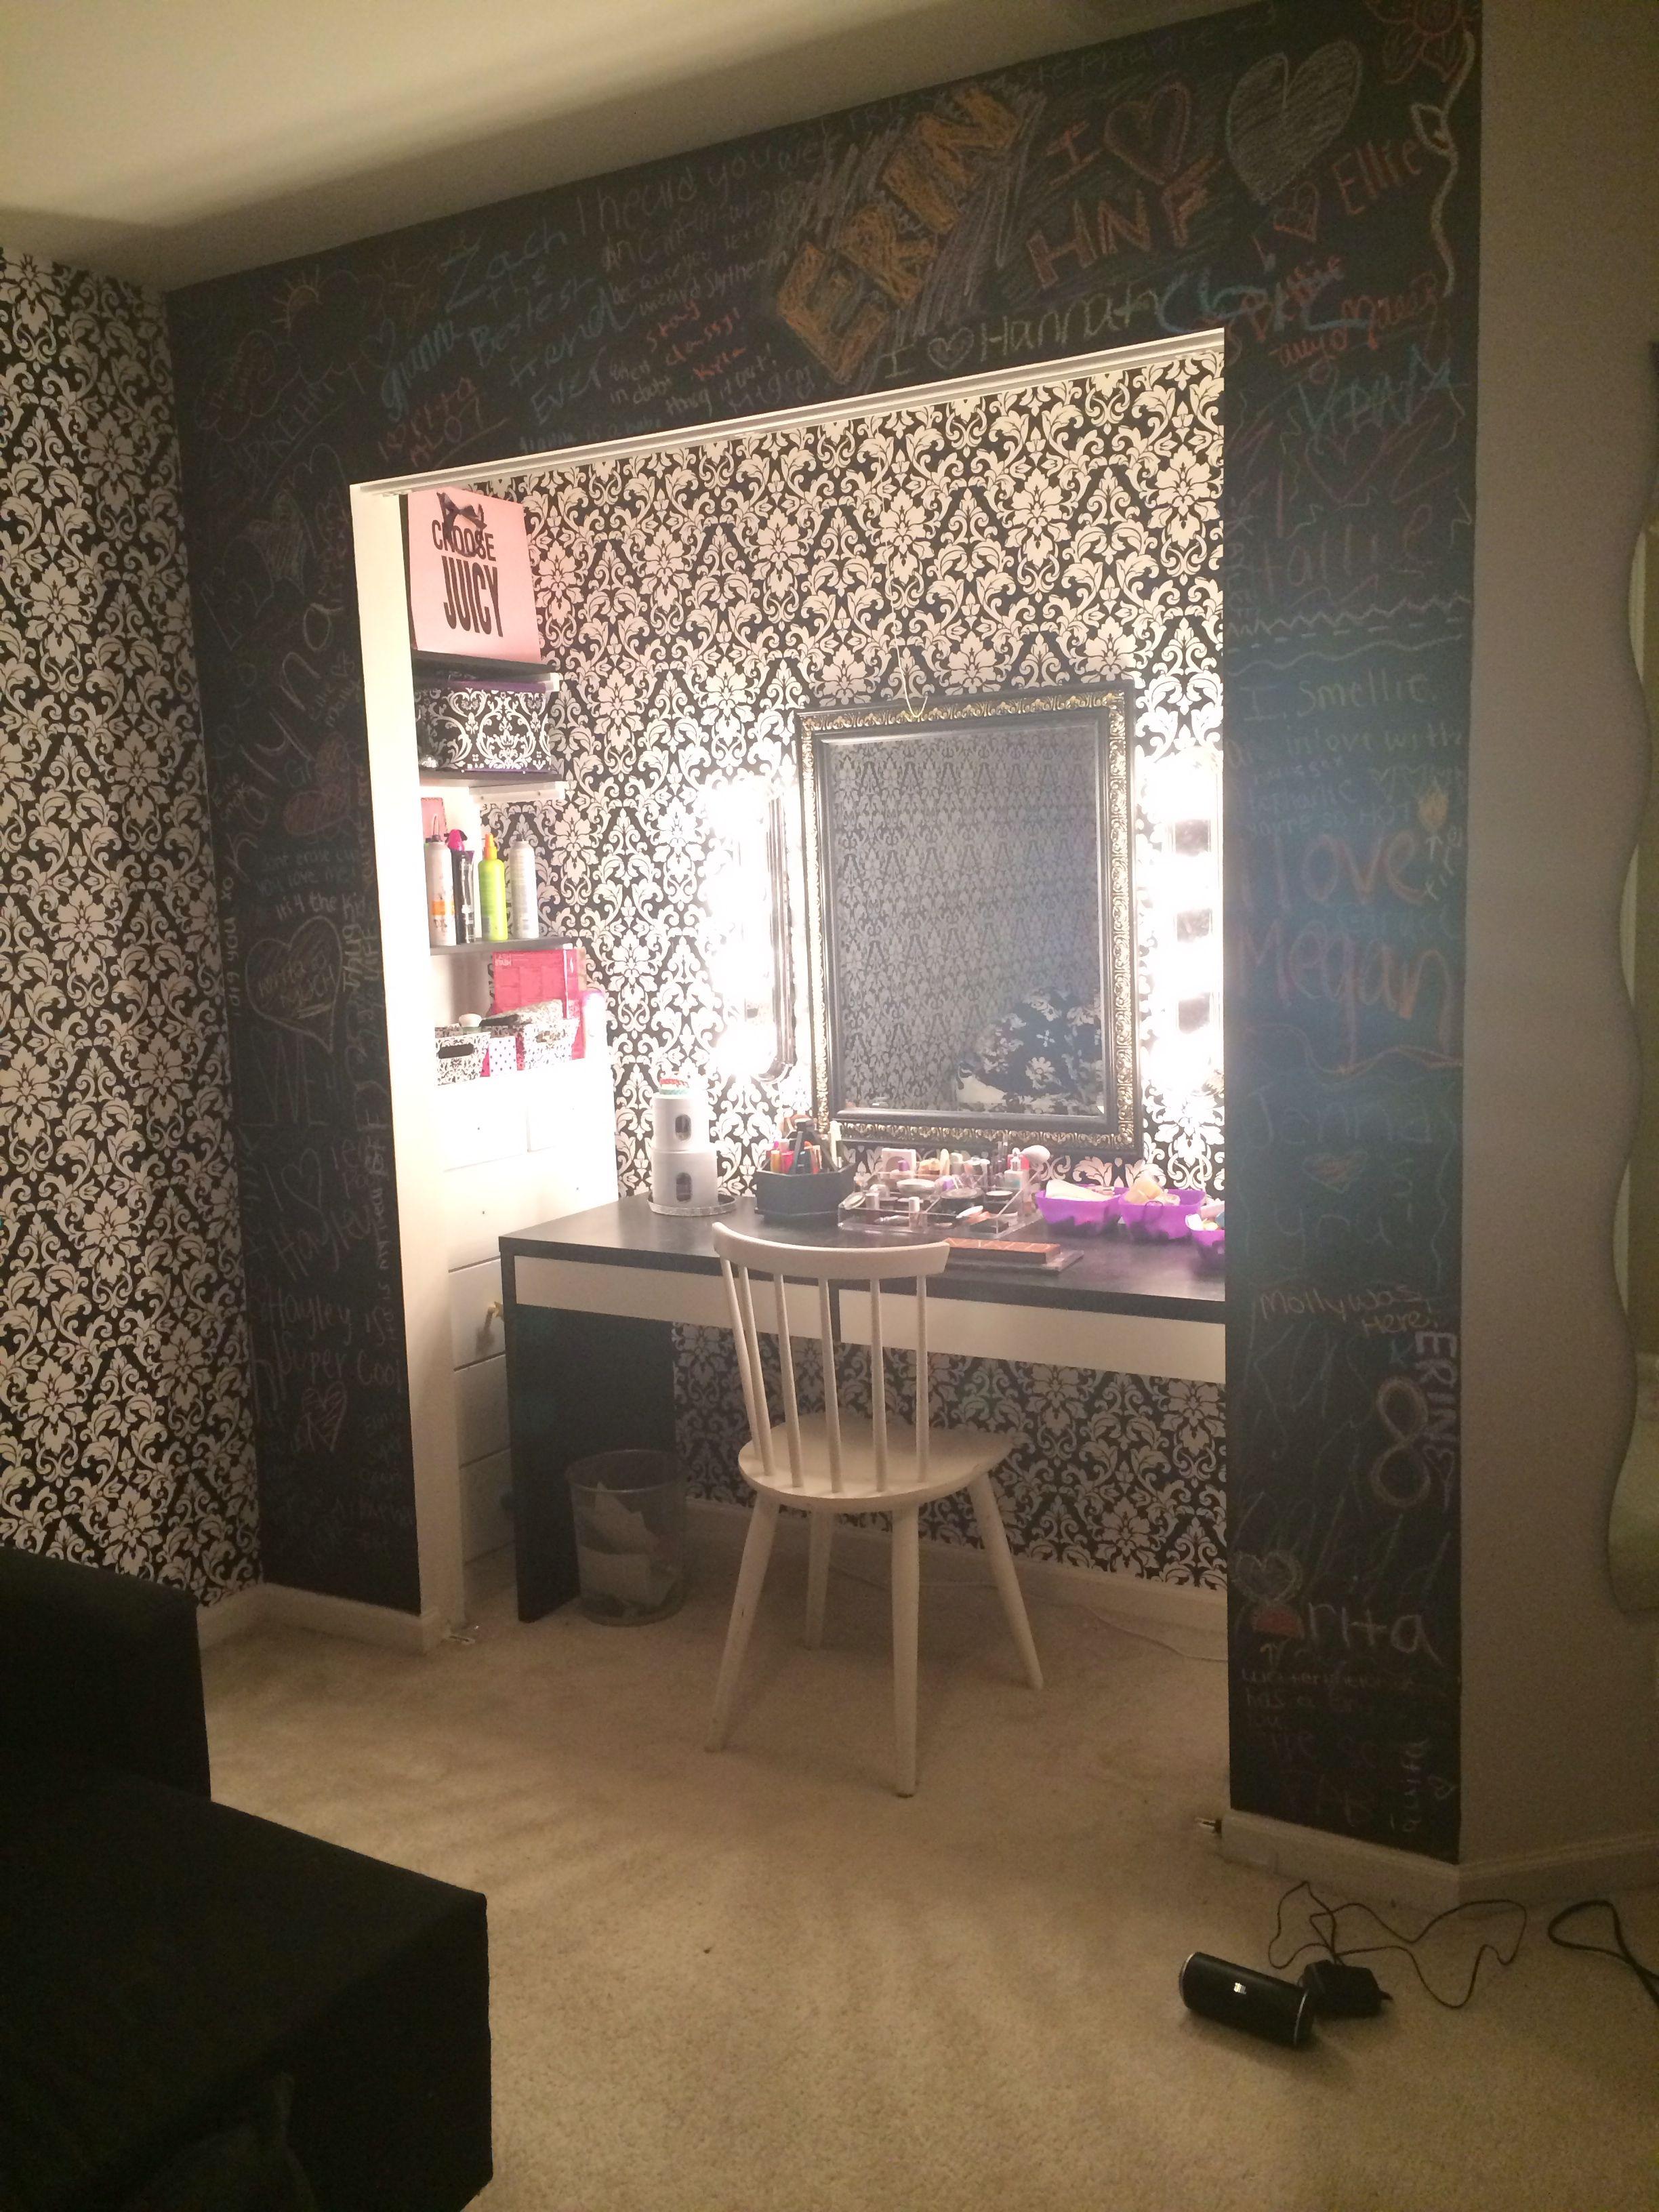 Closet vanity - love the wallpaper backgrounf | Beauty room decor ...